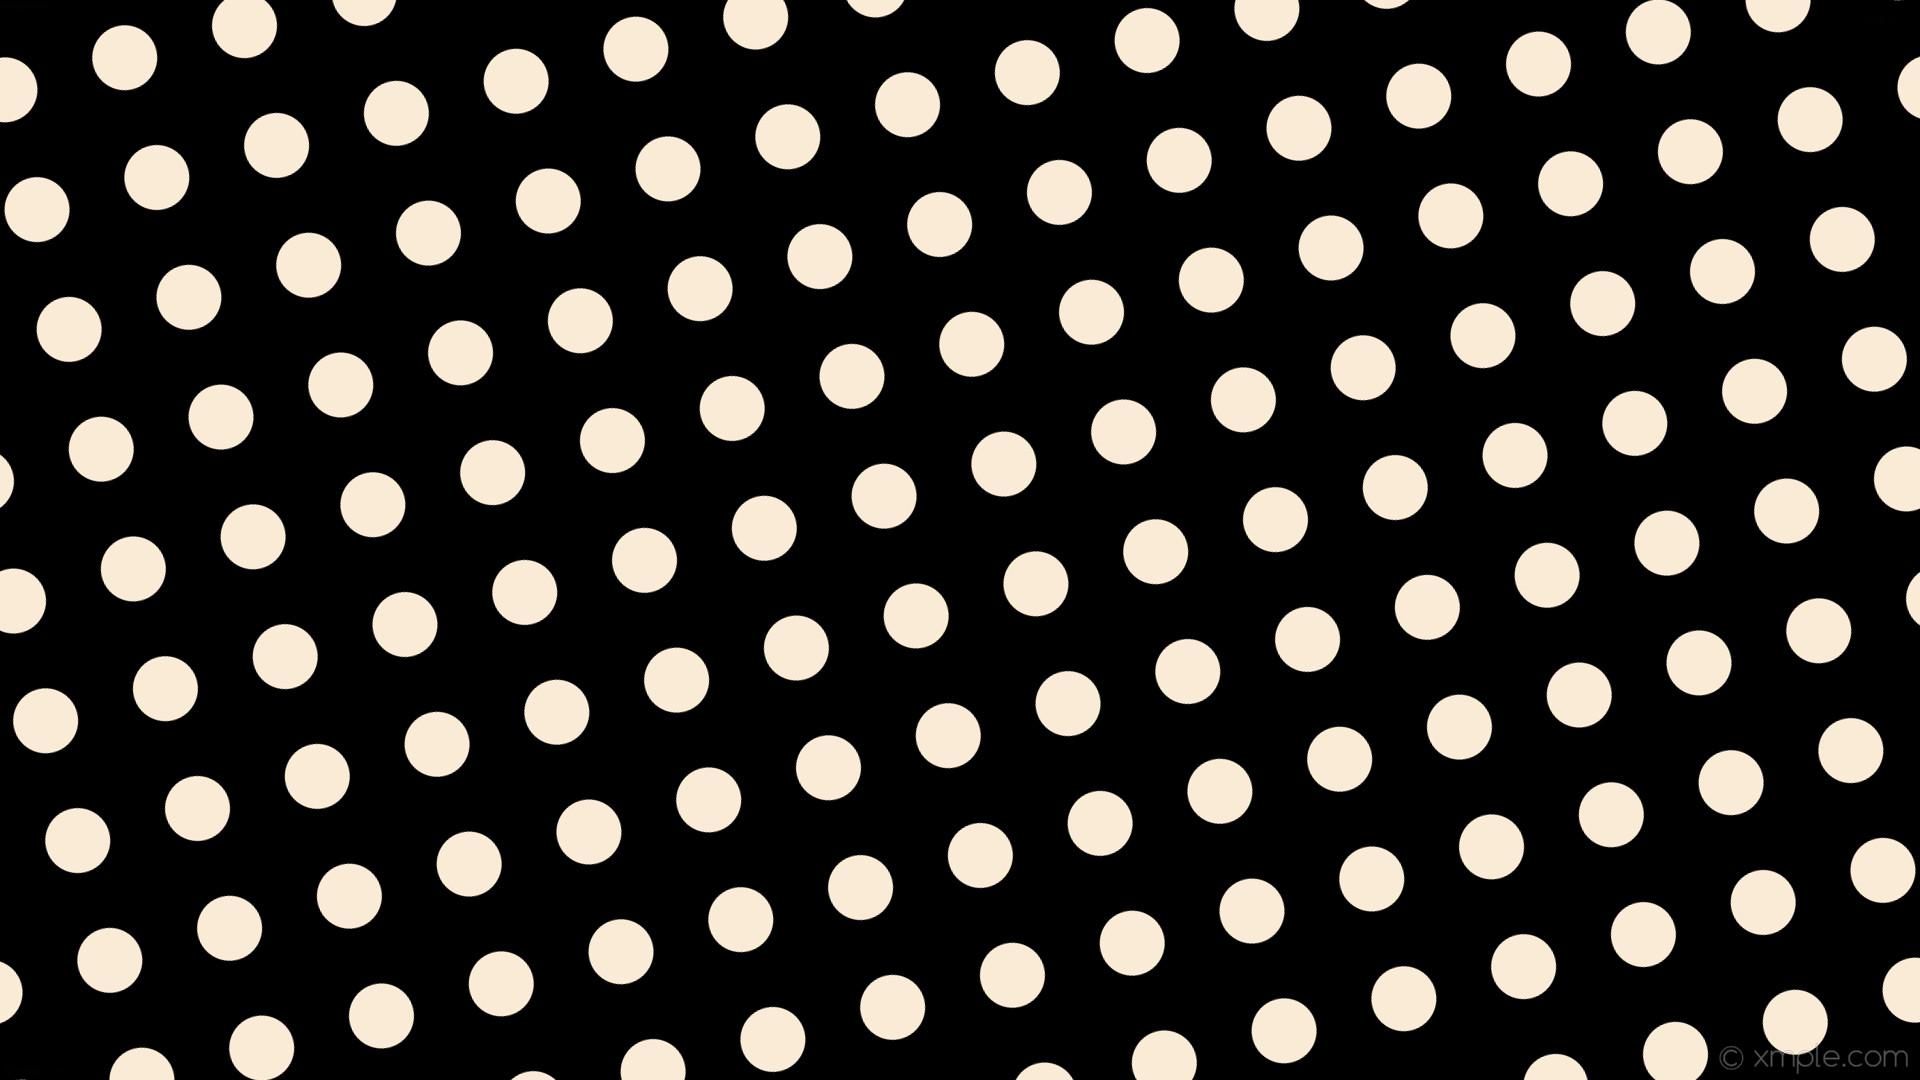 wallpaper spots white dots polka black antique white #000000 #faebd7 285°  65px 124px